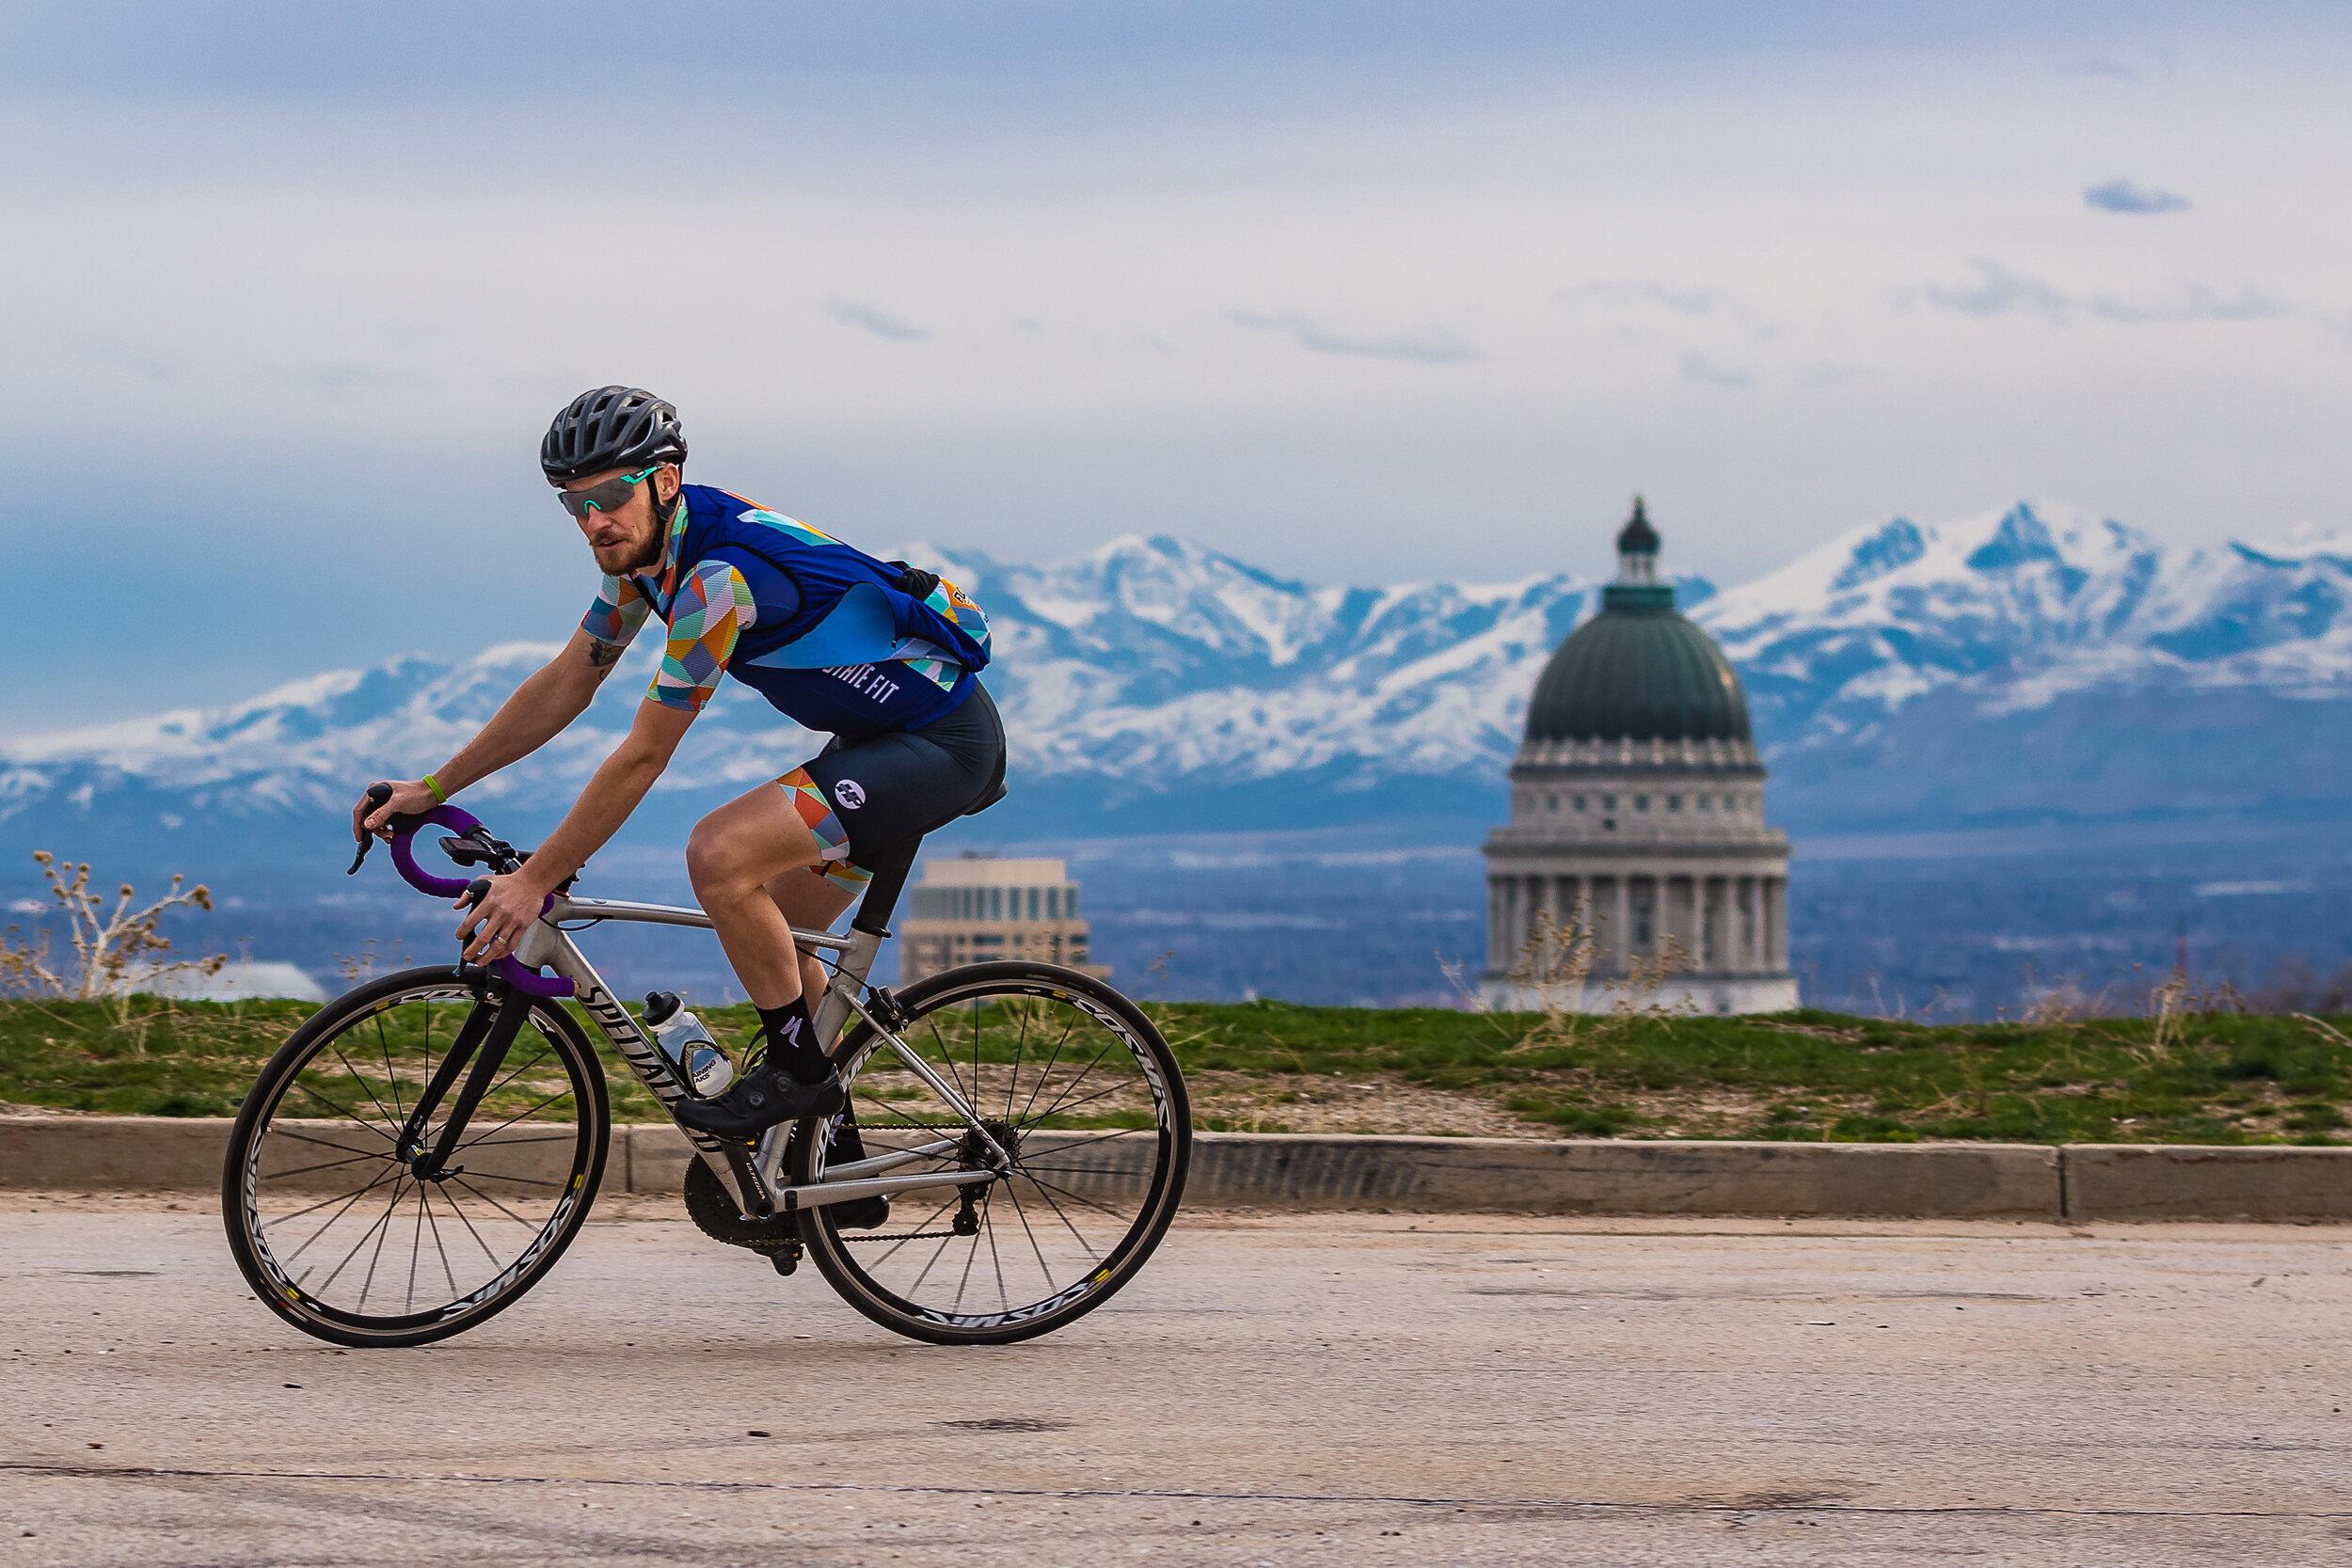 Peak_State_Fit_Utah.jpg